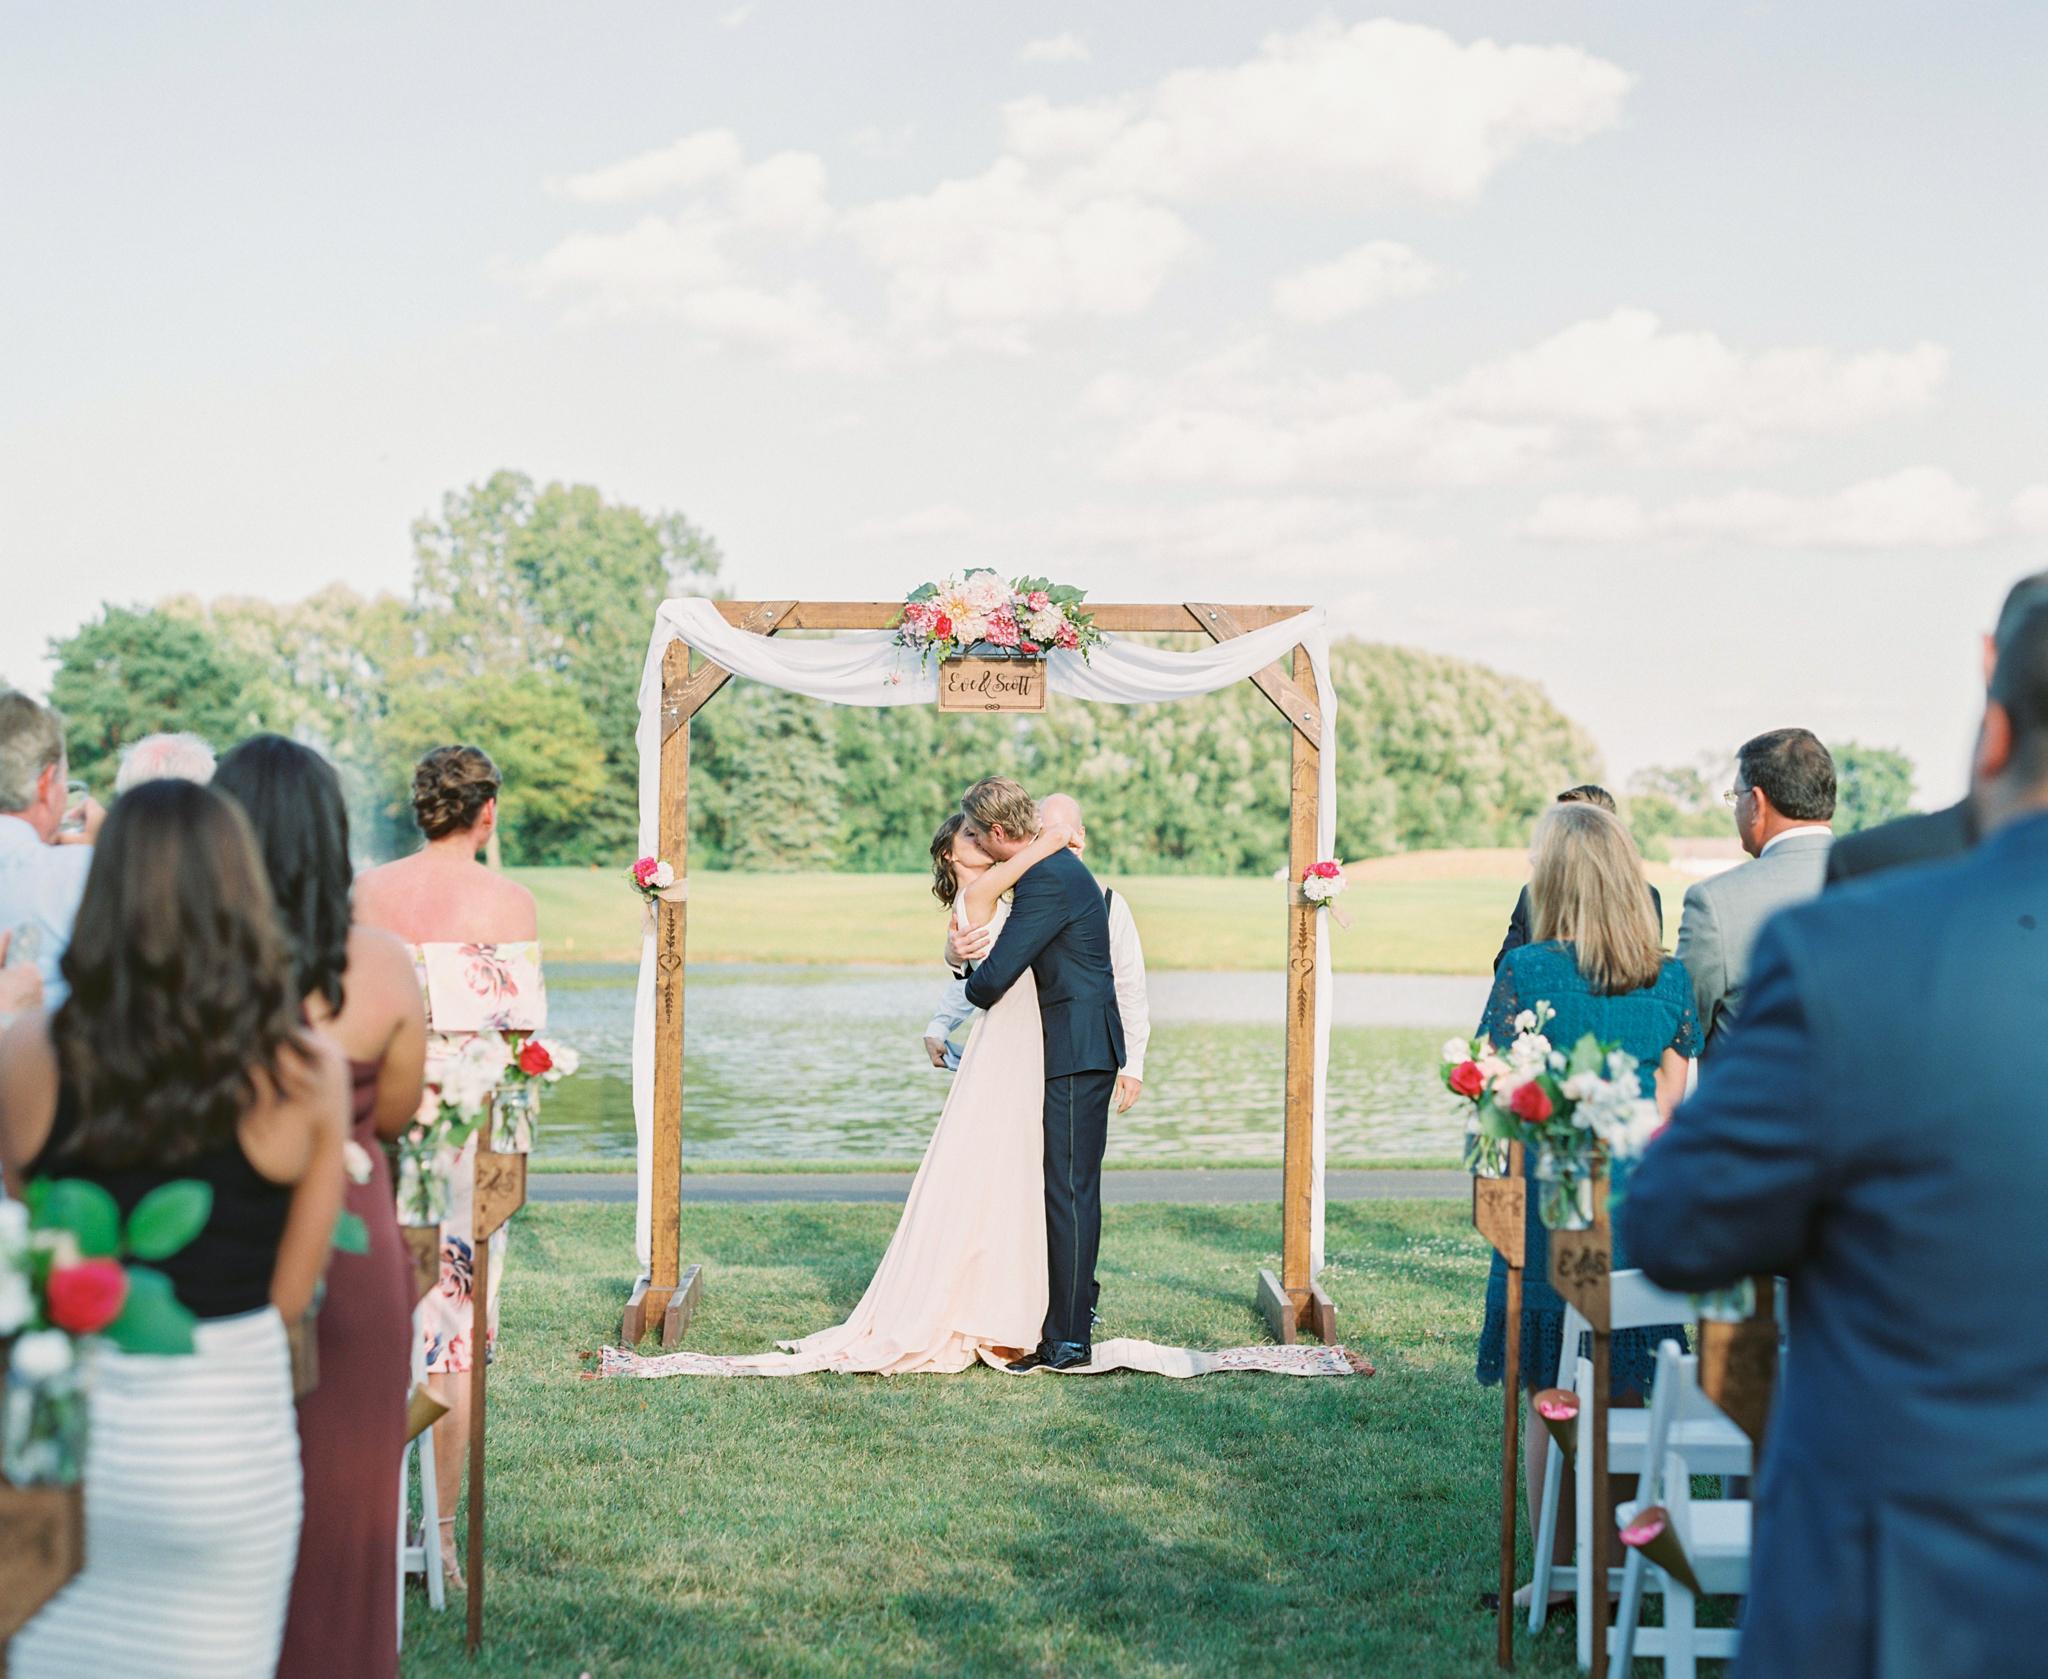 scott_eve_little_turtle_wedding_columbus_ohio (69 of 92).jpg